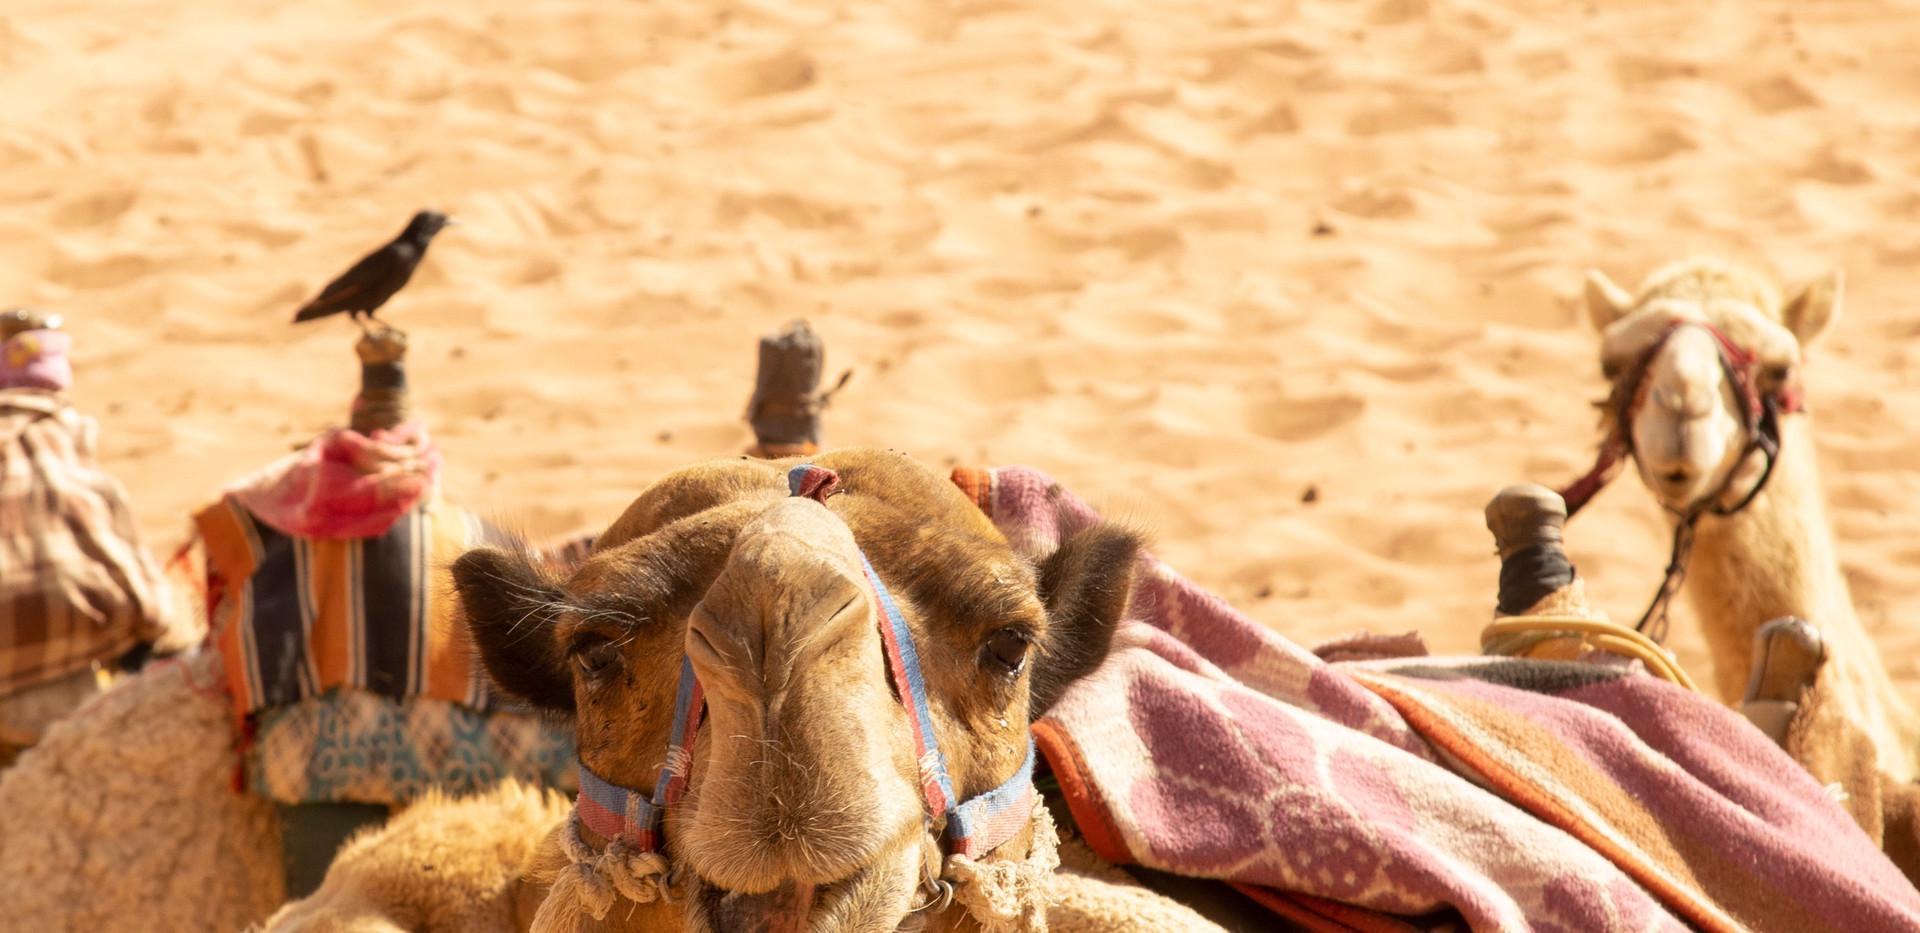 Jordan camel portrait